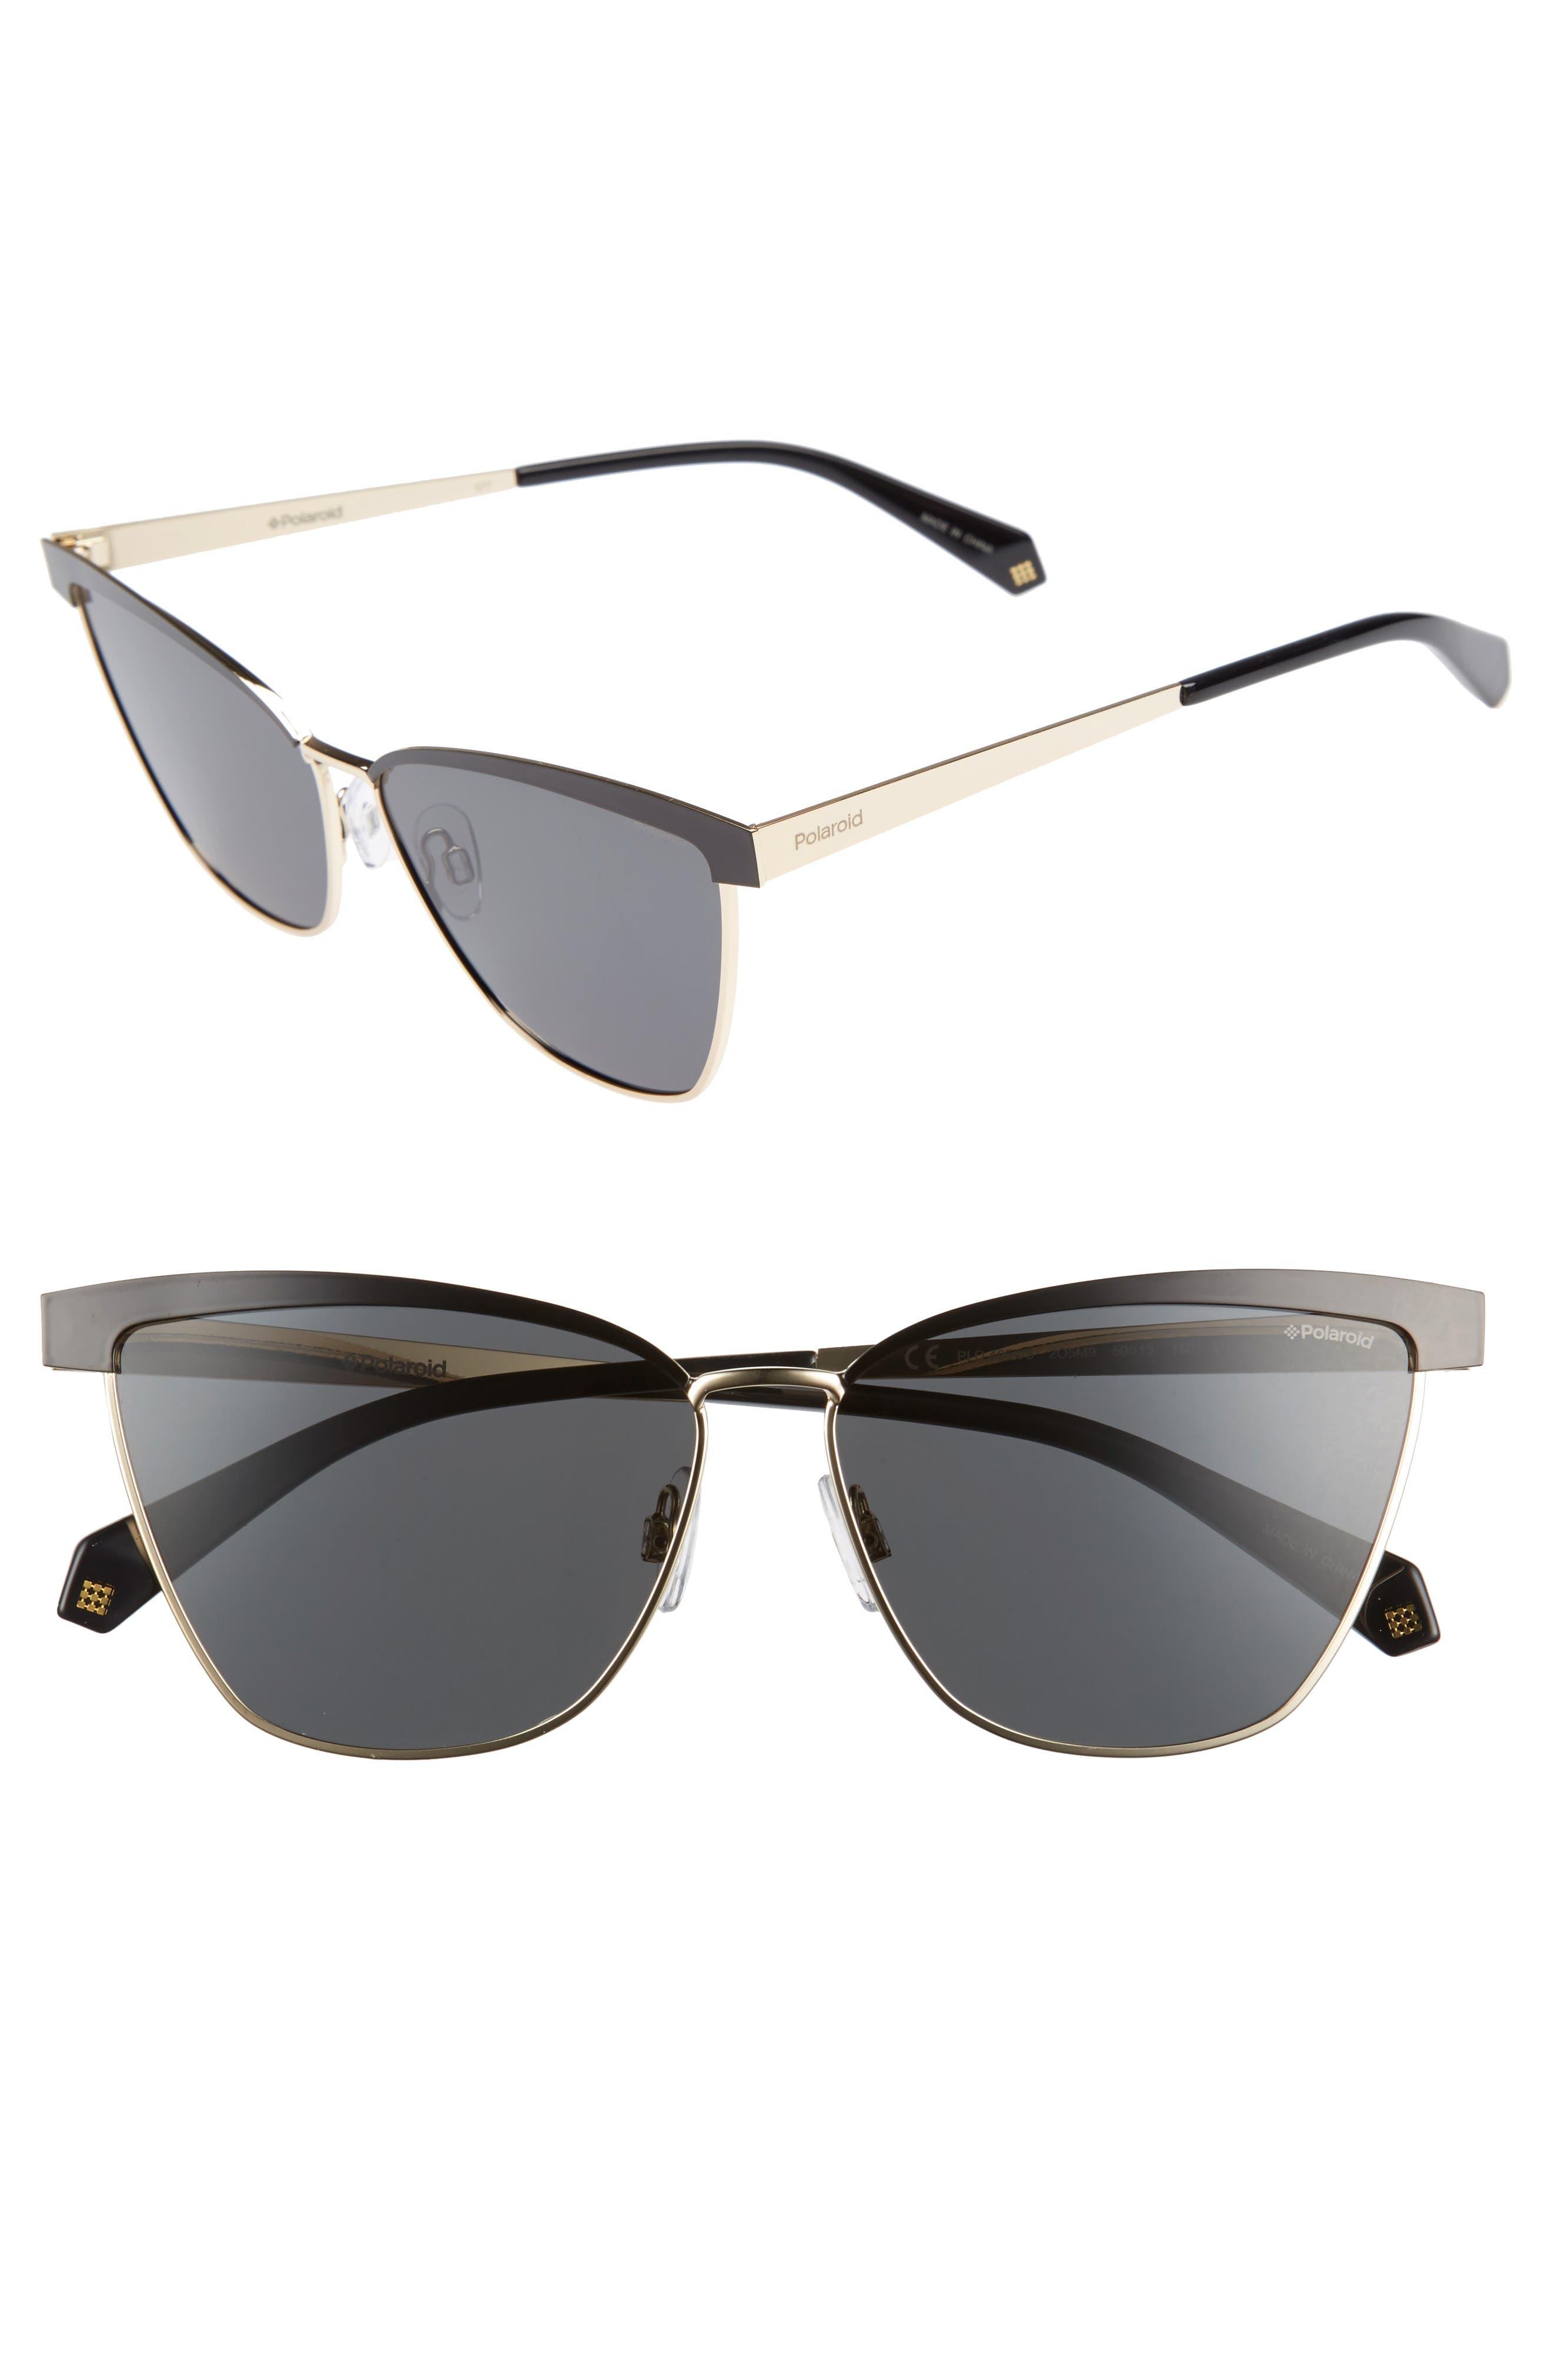 Polaroid 60mm Polarized Cat Eye Sunglasses